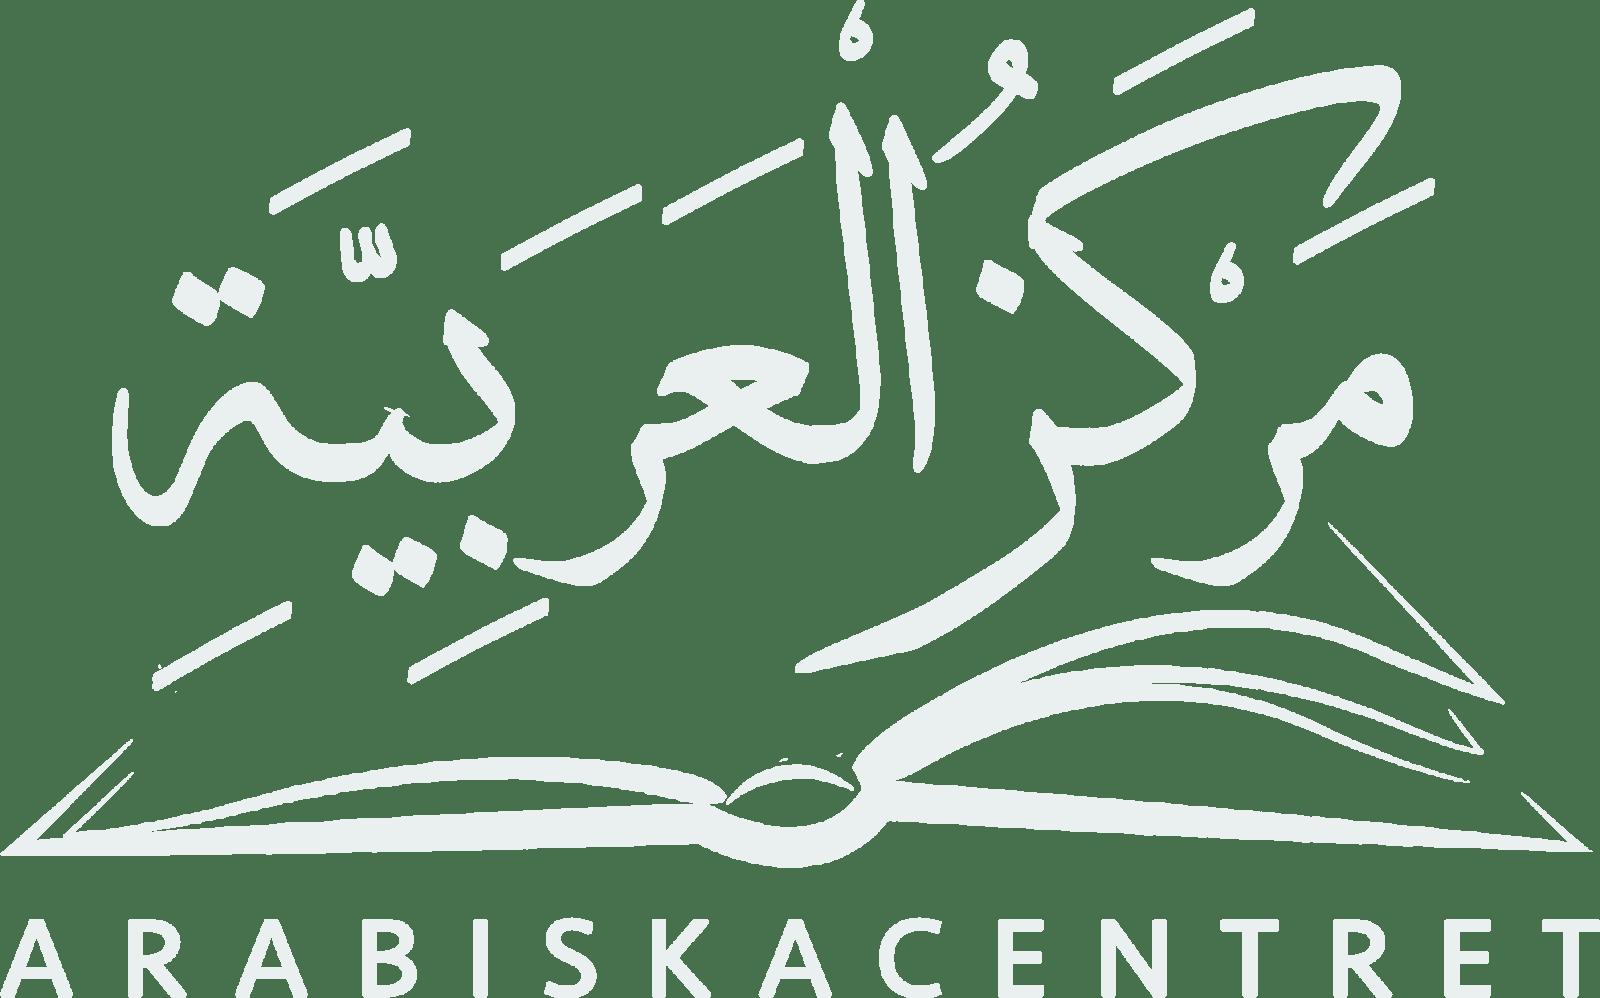 arabiskacentret logga copy